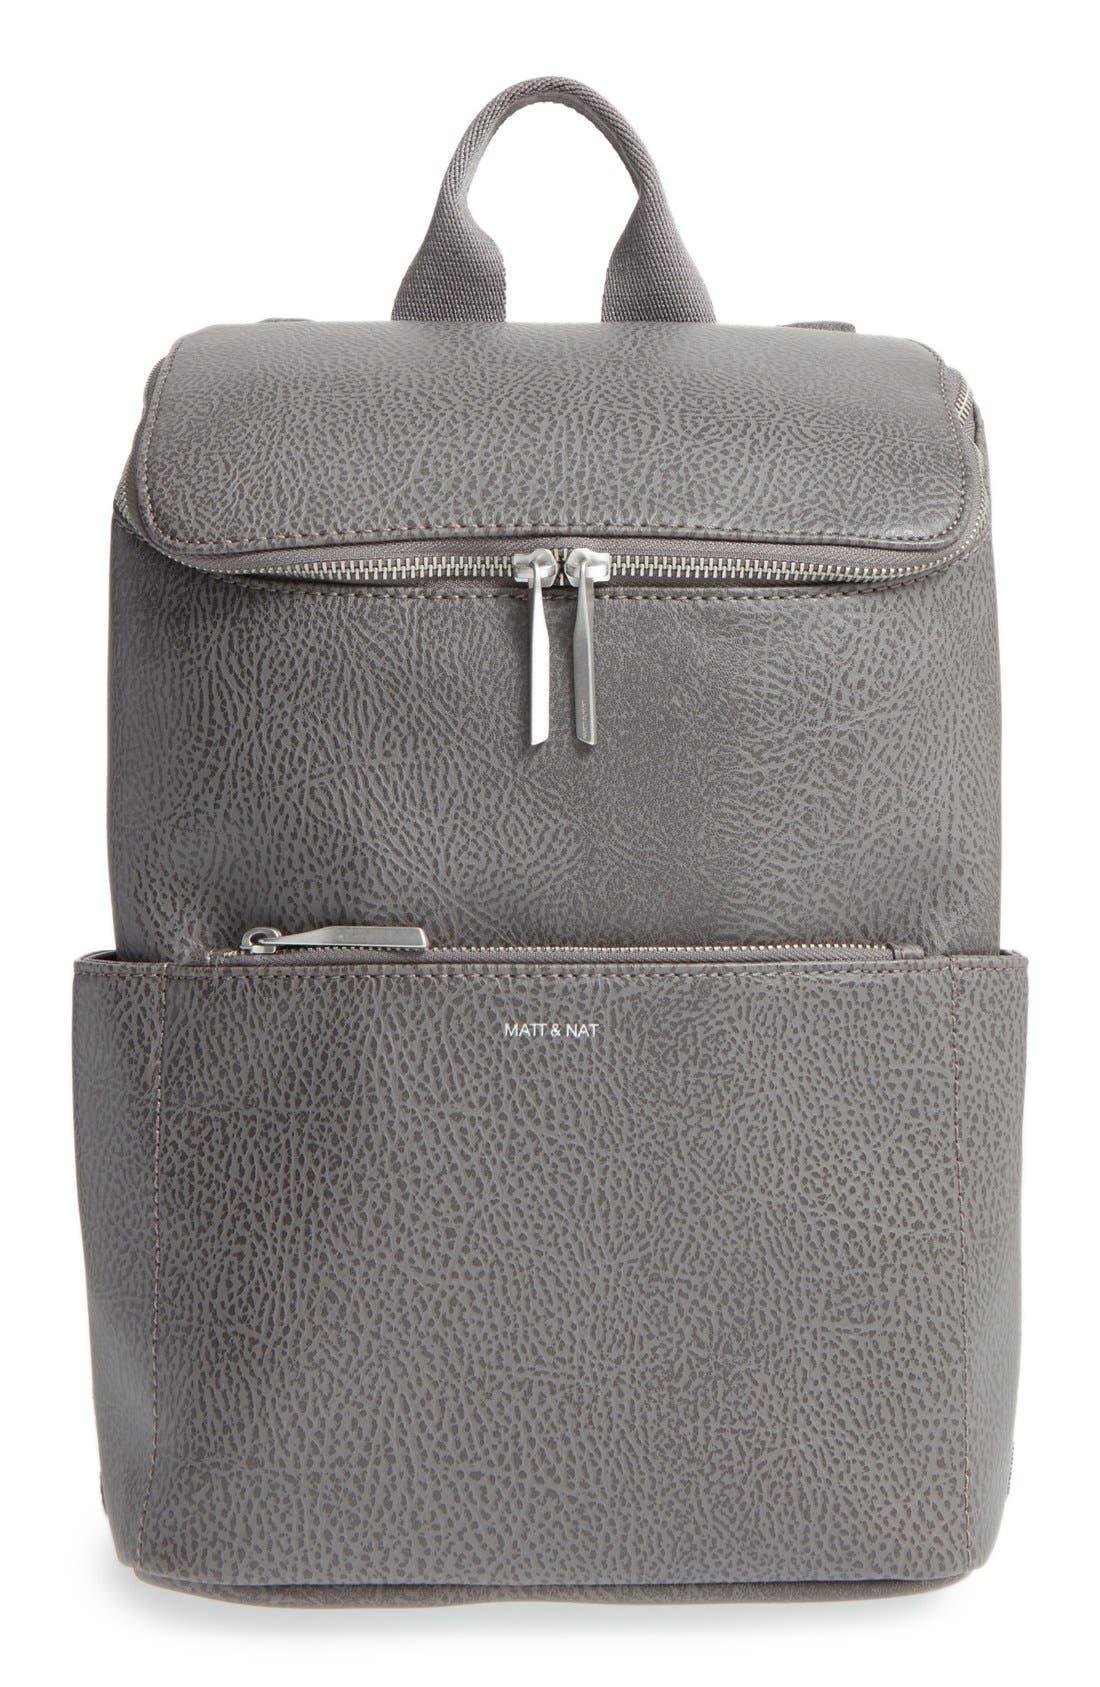 Alternate Image 1 Selected - Matt & Nat 'Brave' Faux Leather Backpack